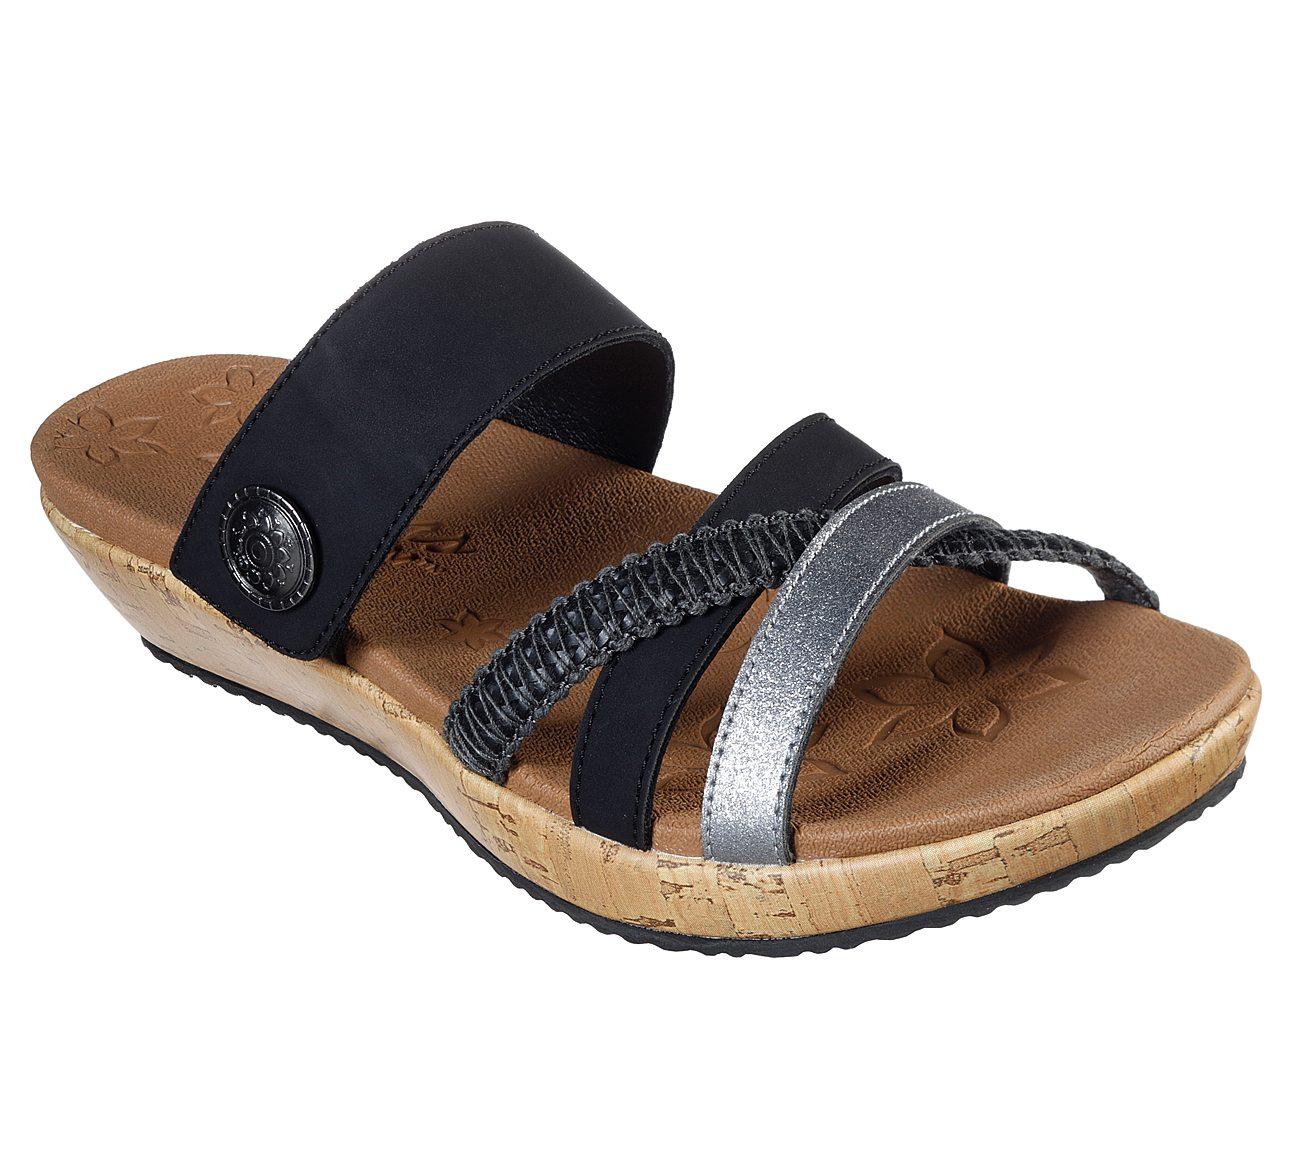 Buy Skechers Brie Star Sky Skechers Cali Shoes Only 163 44 00